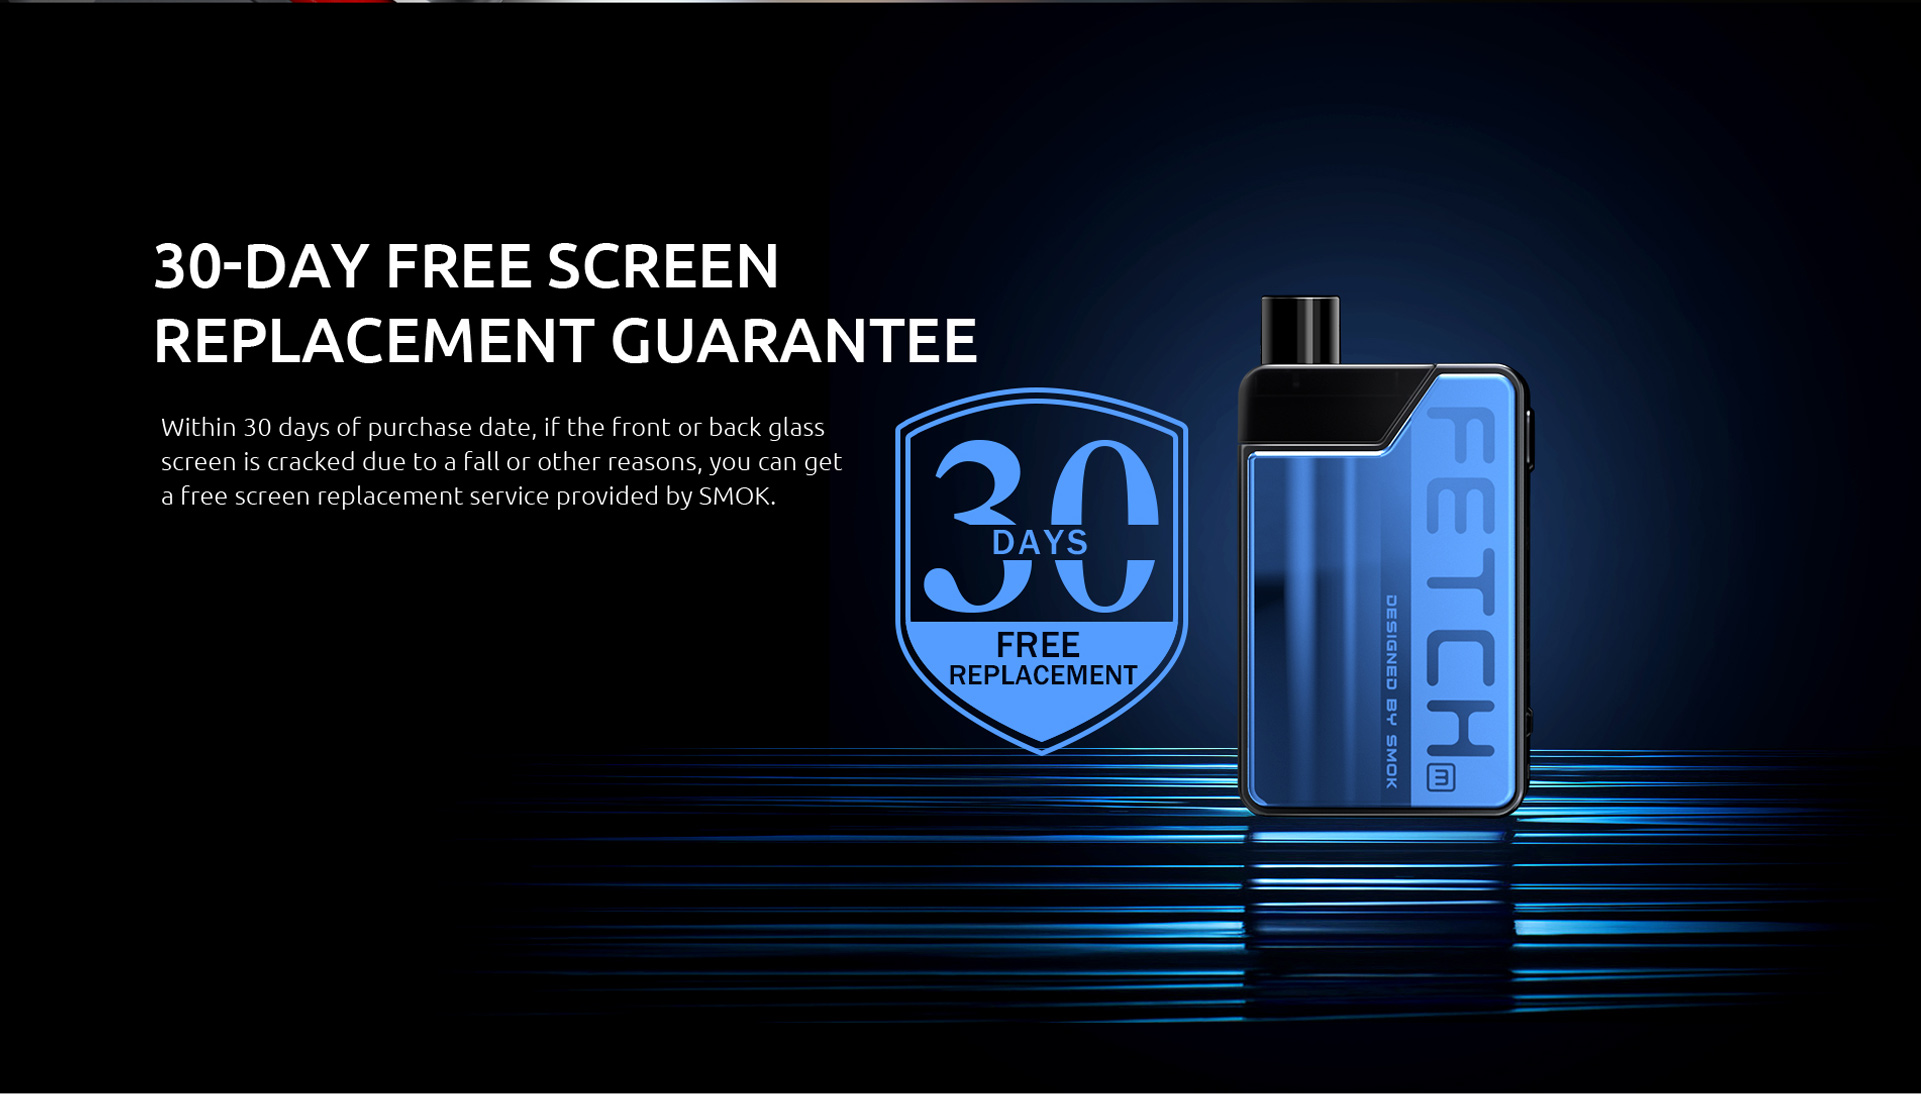 SMOK Fetch Mini Has 30-Day Free Screen Replacement Guarantee